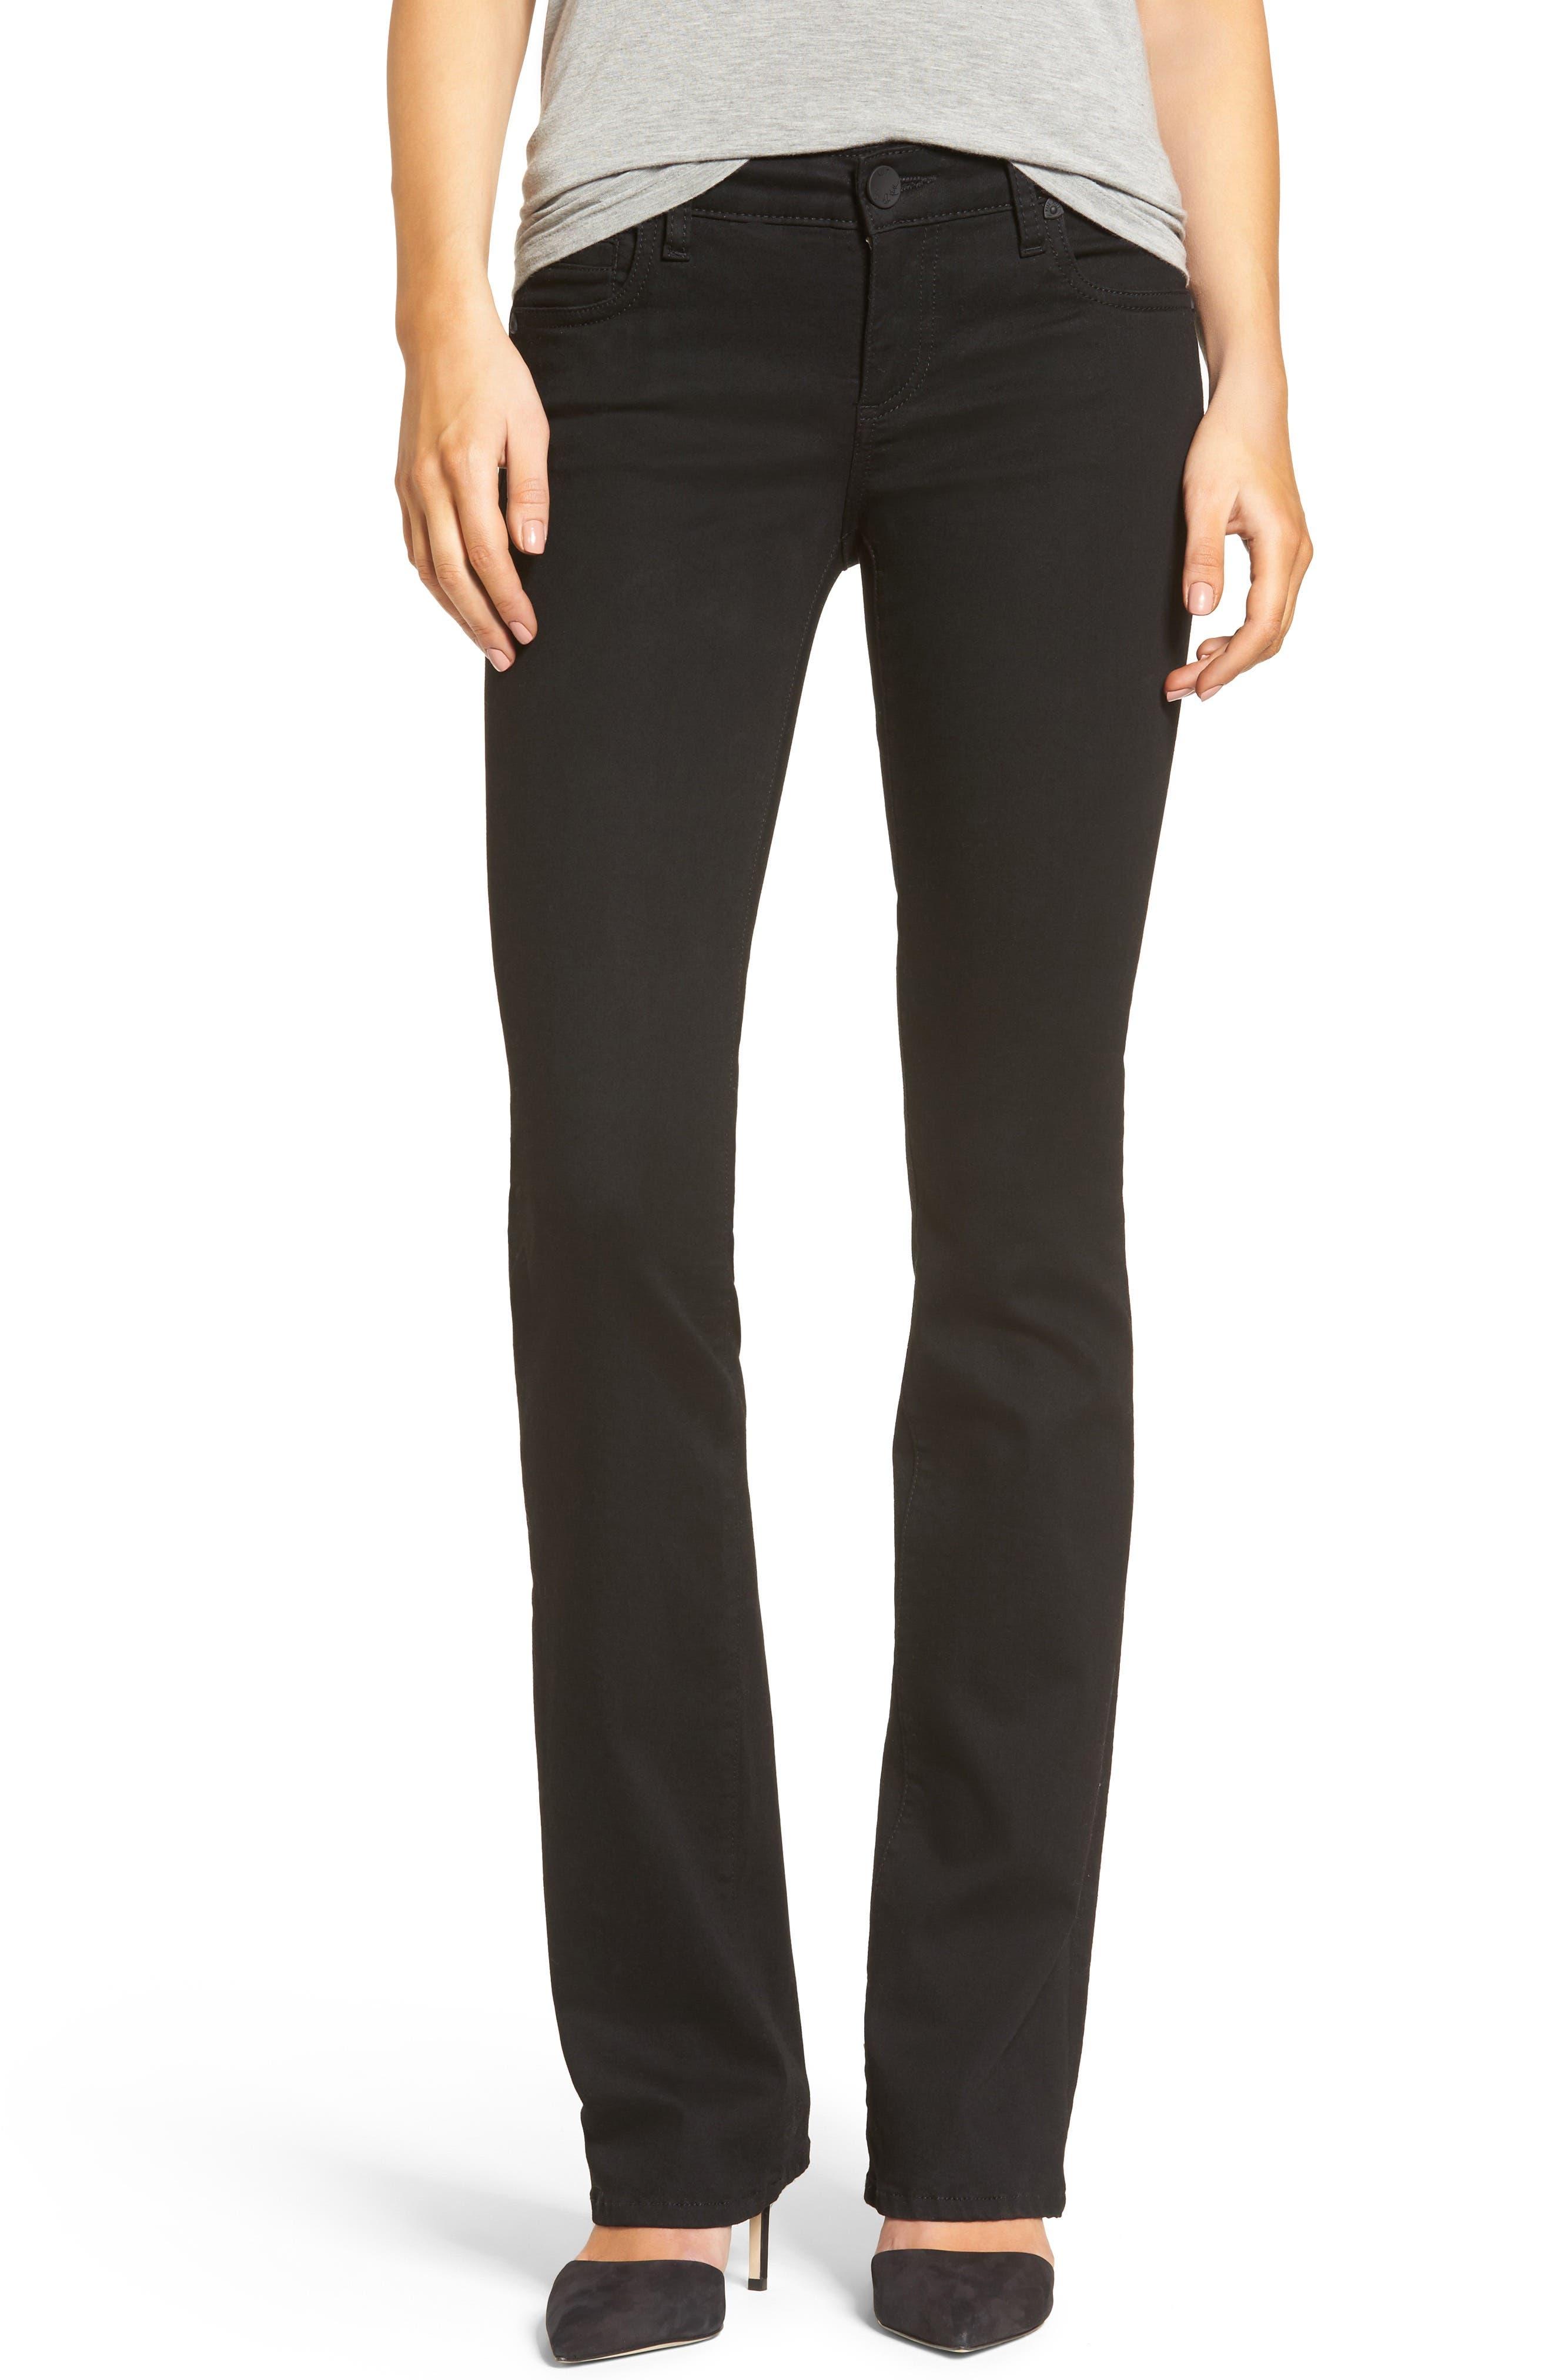 Natalie Stretch Bootleg Jeans,                         Main,                         color, Black